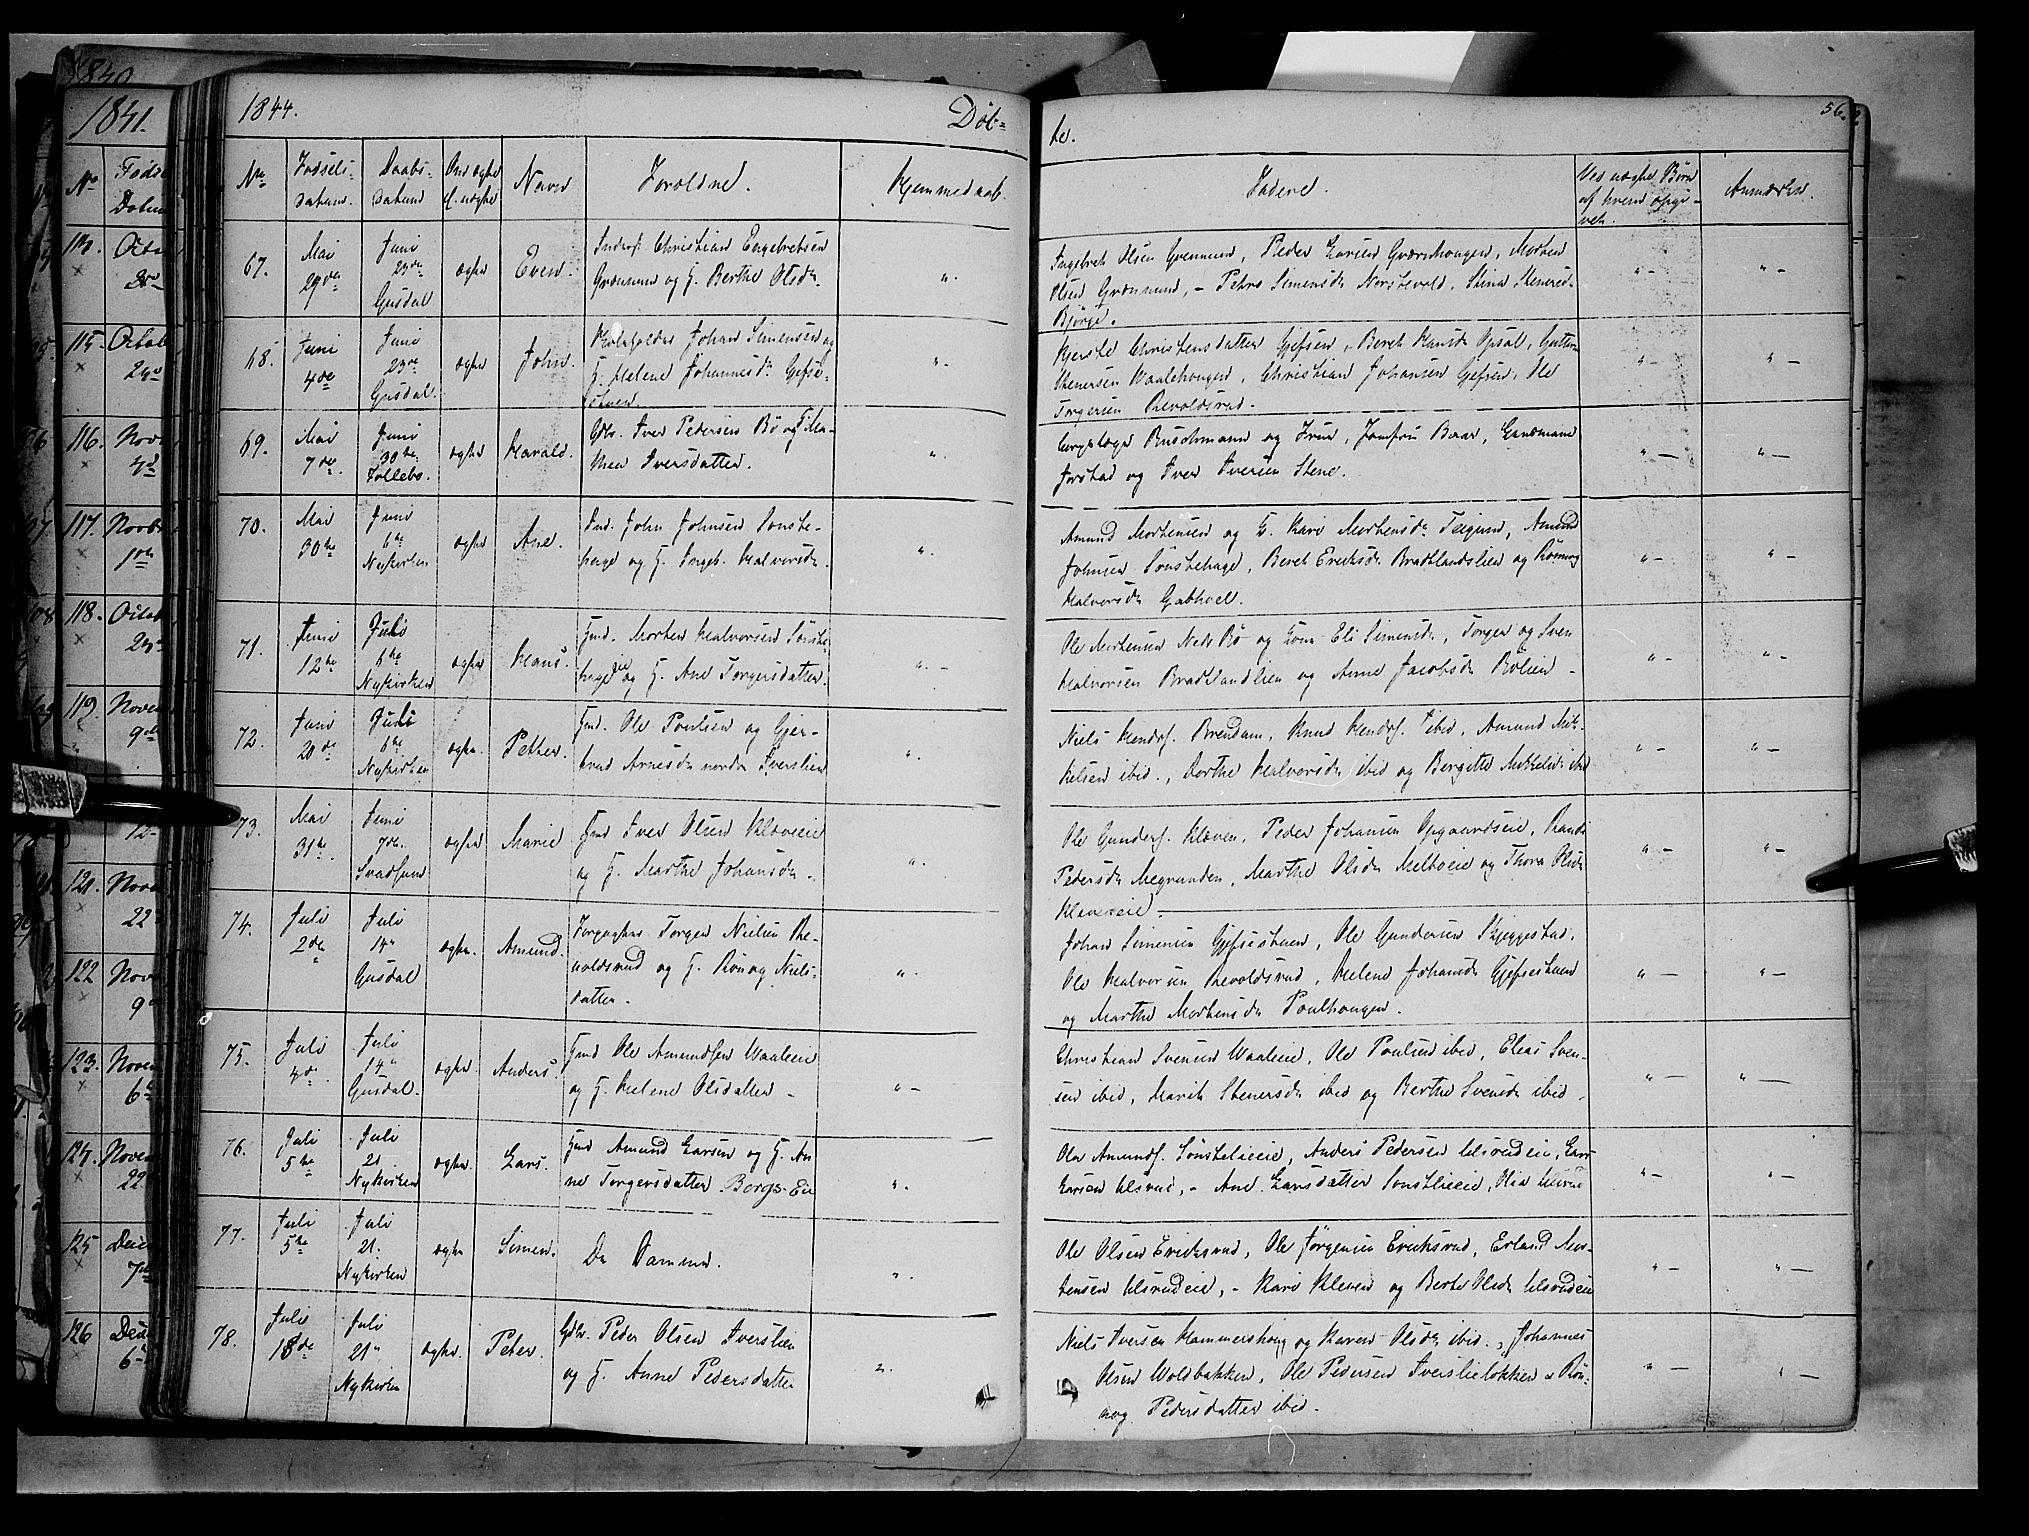 SAH, Gausdal prestekontor, Ministerialbok nr. 7, 1840-1850, s. 56